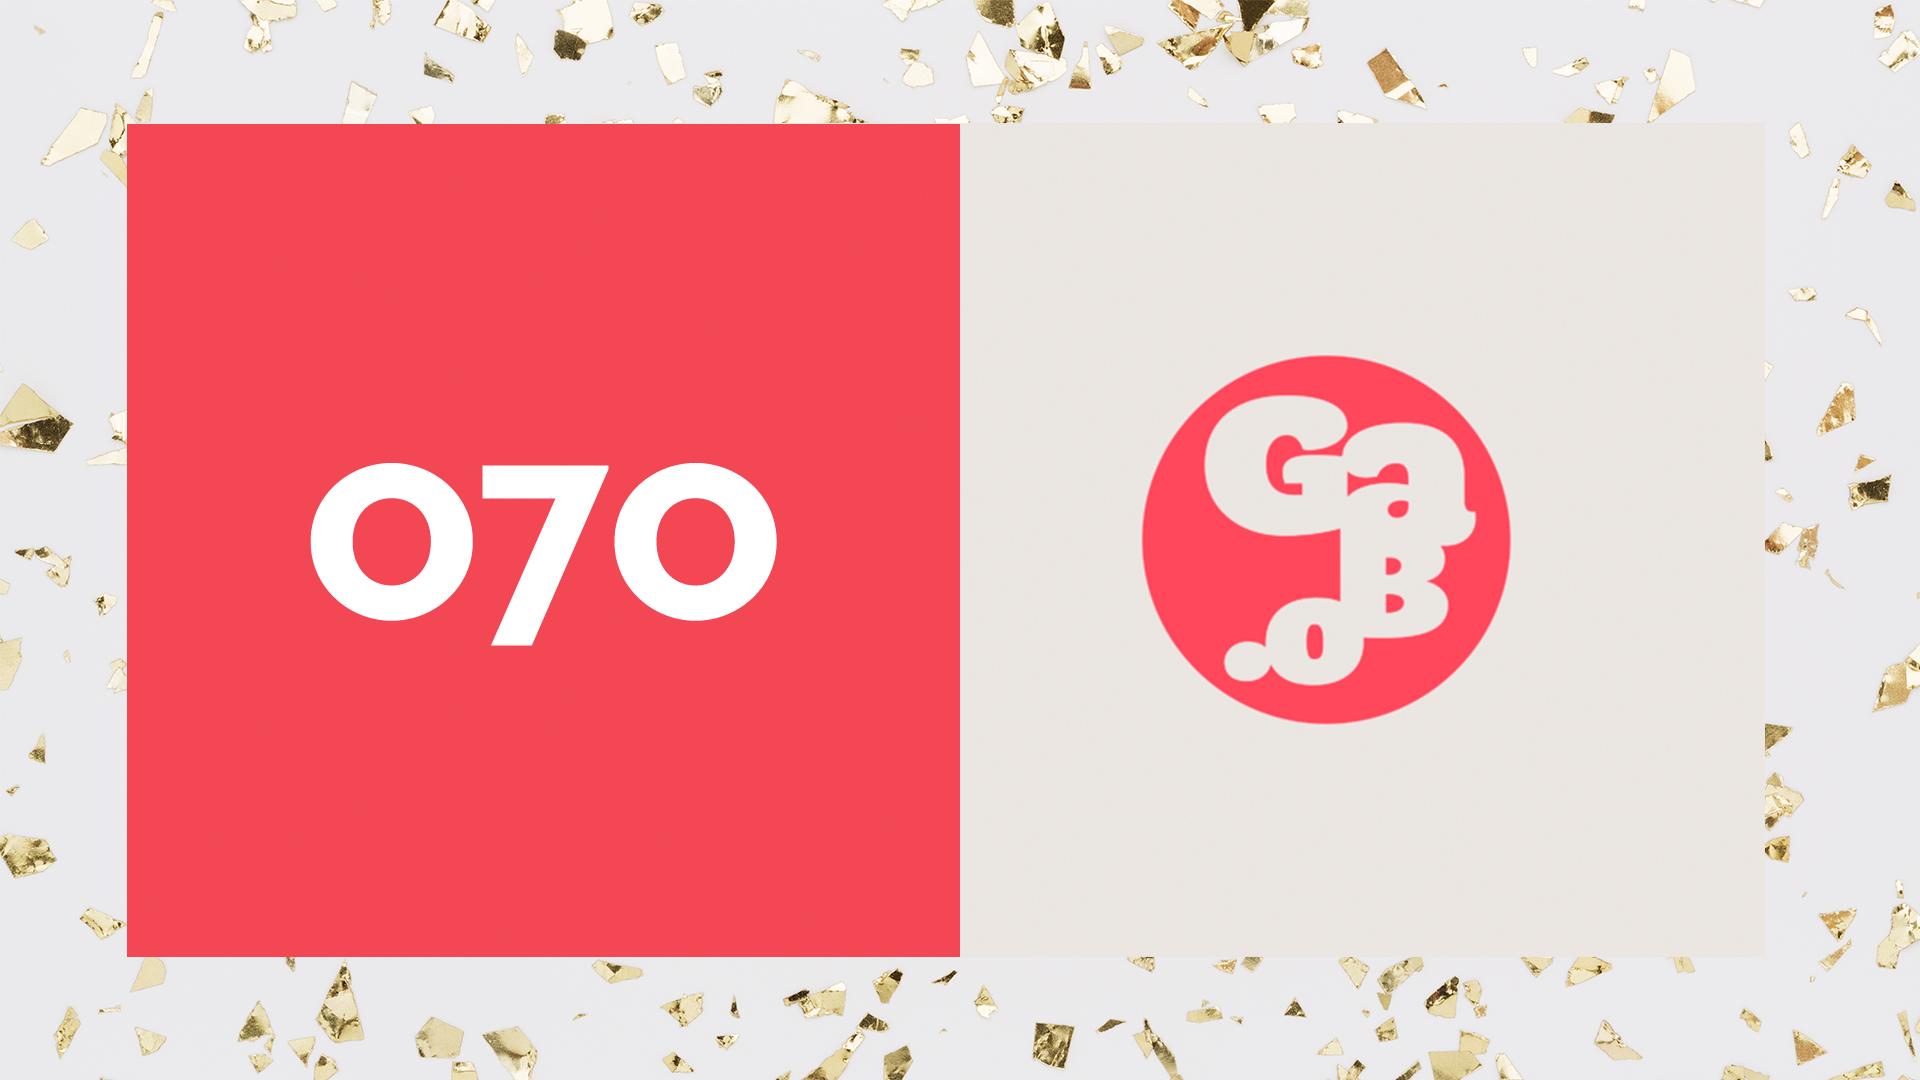 Cerosetenta en el Premio Gabo 2020